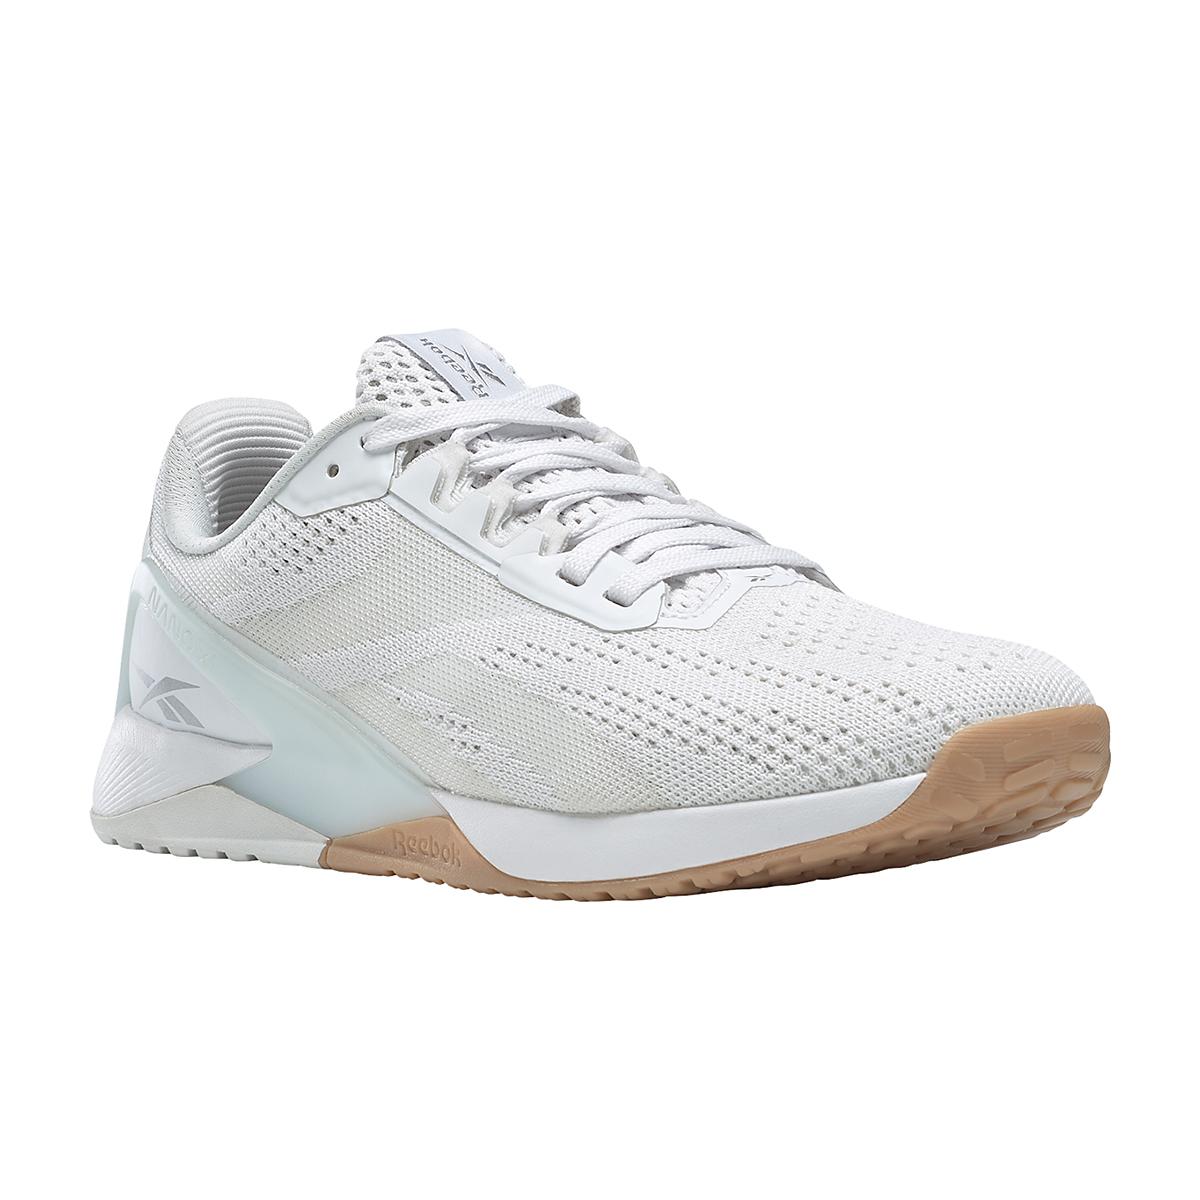 Women's Reebok Nano X1 Training Shoe - Color: White/True Grey/Rubber Gum - Size: 5 - Width: Regular, White/True Grey/Rubber Gum, large, image 2